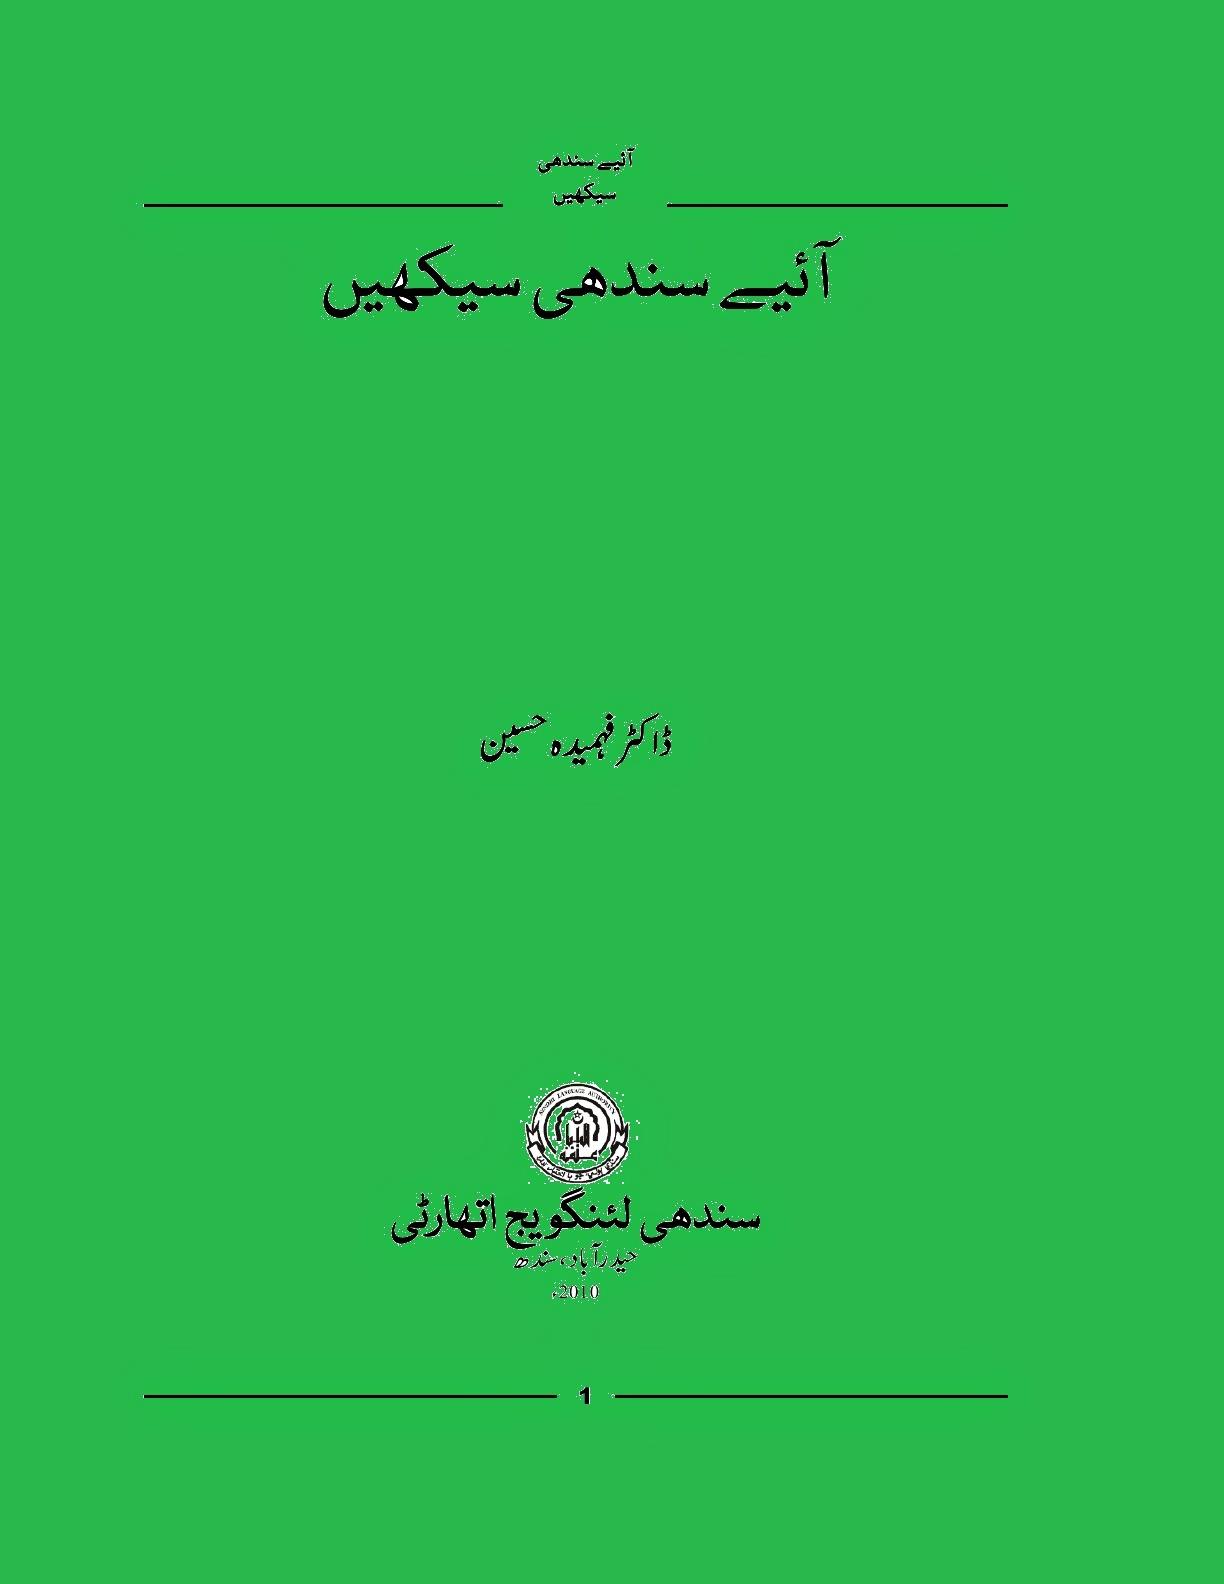 http://www.mediafire.com/view/0fqho2cq3md21ir/Aaeeay_Sindhi_Seekhen.pdf